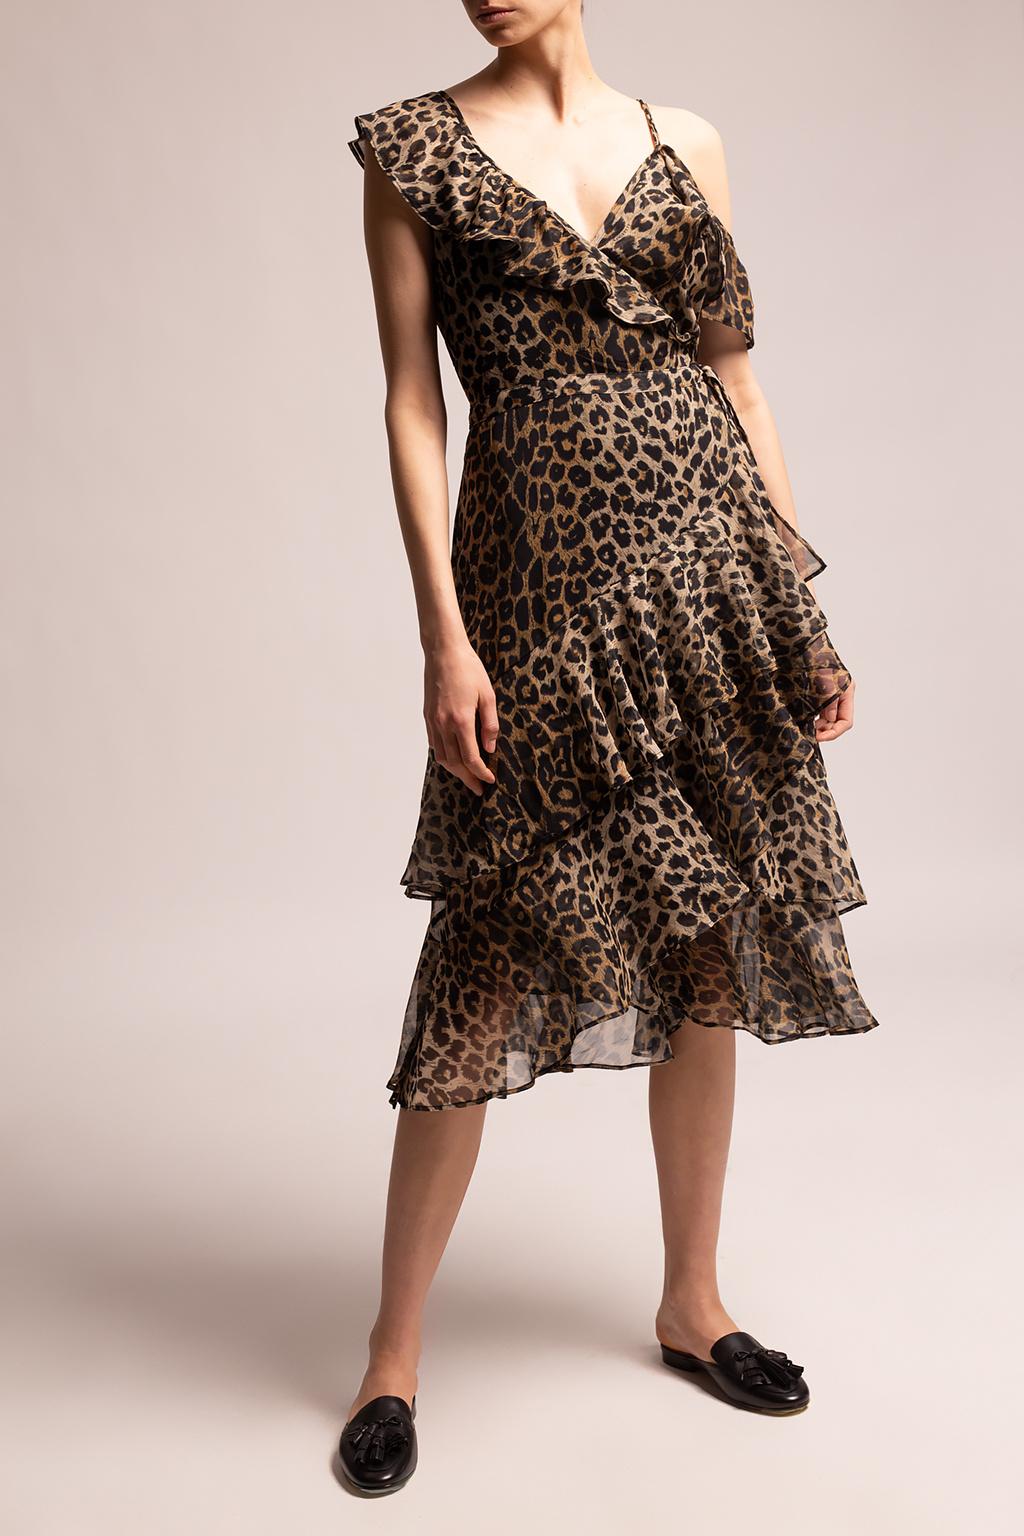 AllSaints 'Kari' dress